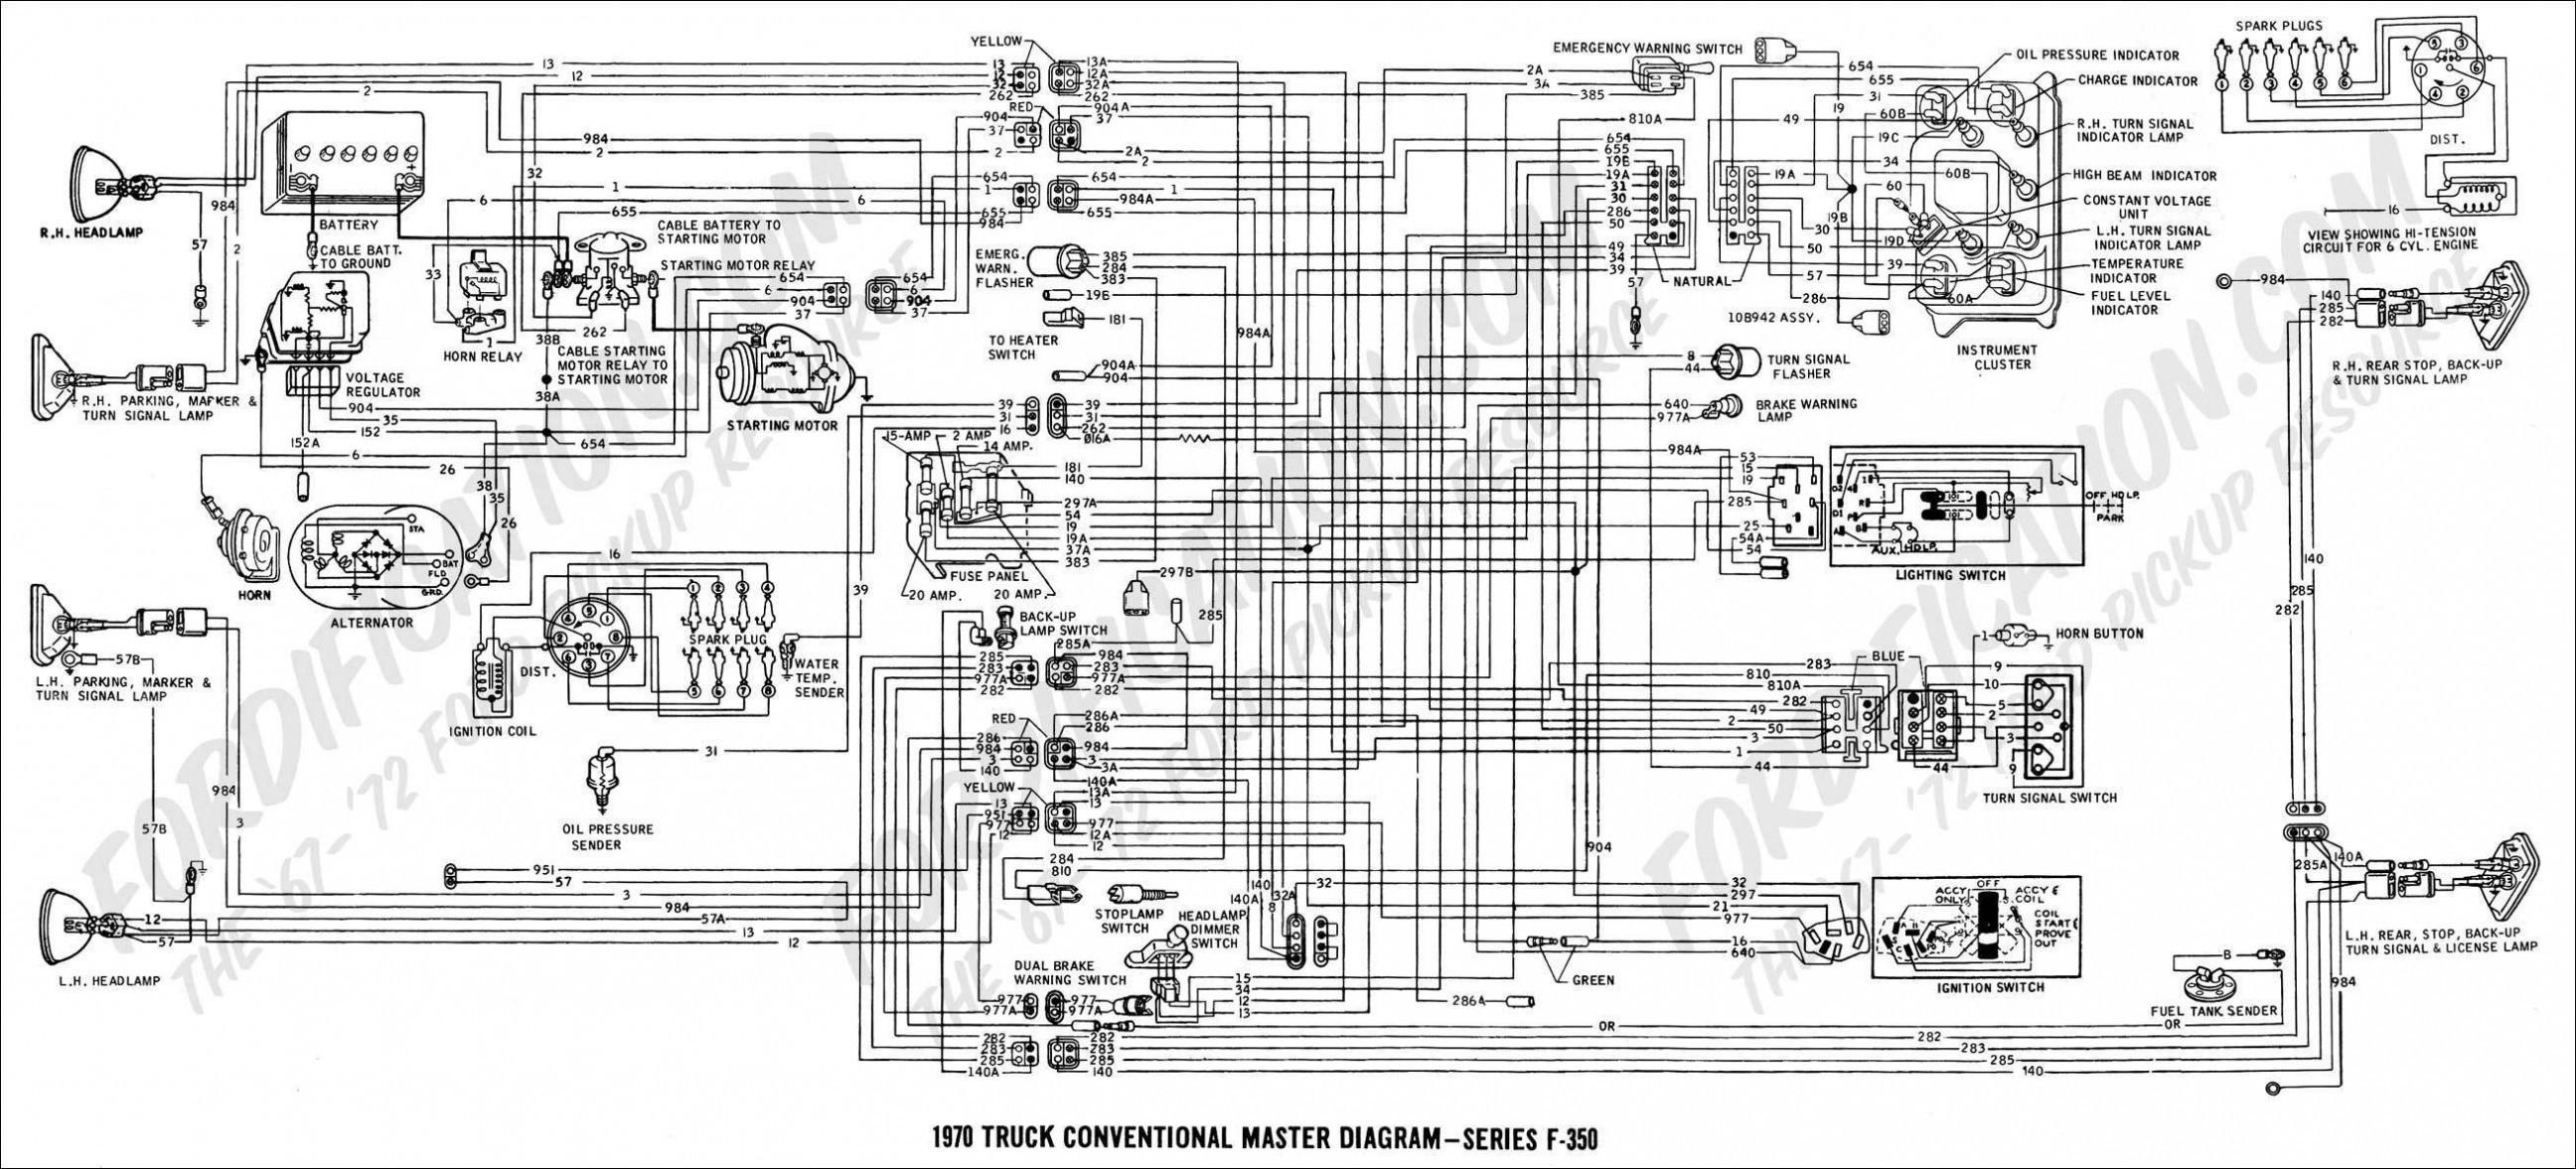 96 F250 Wiring Diagram - Free Wiring Diagram For You • - 7.3 Powerstroke Wiring Diagram